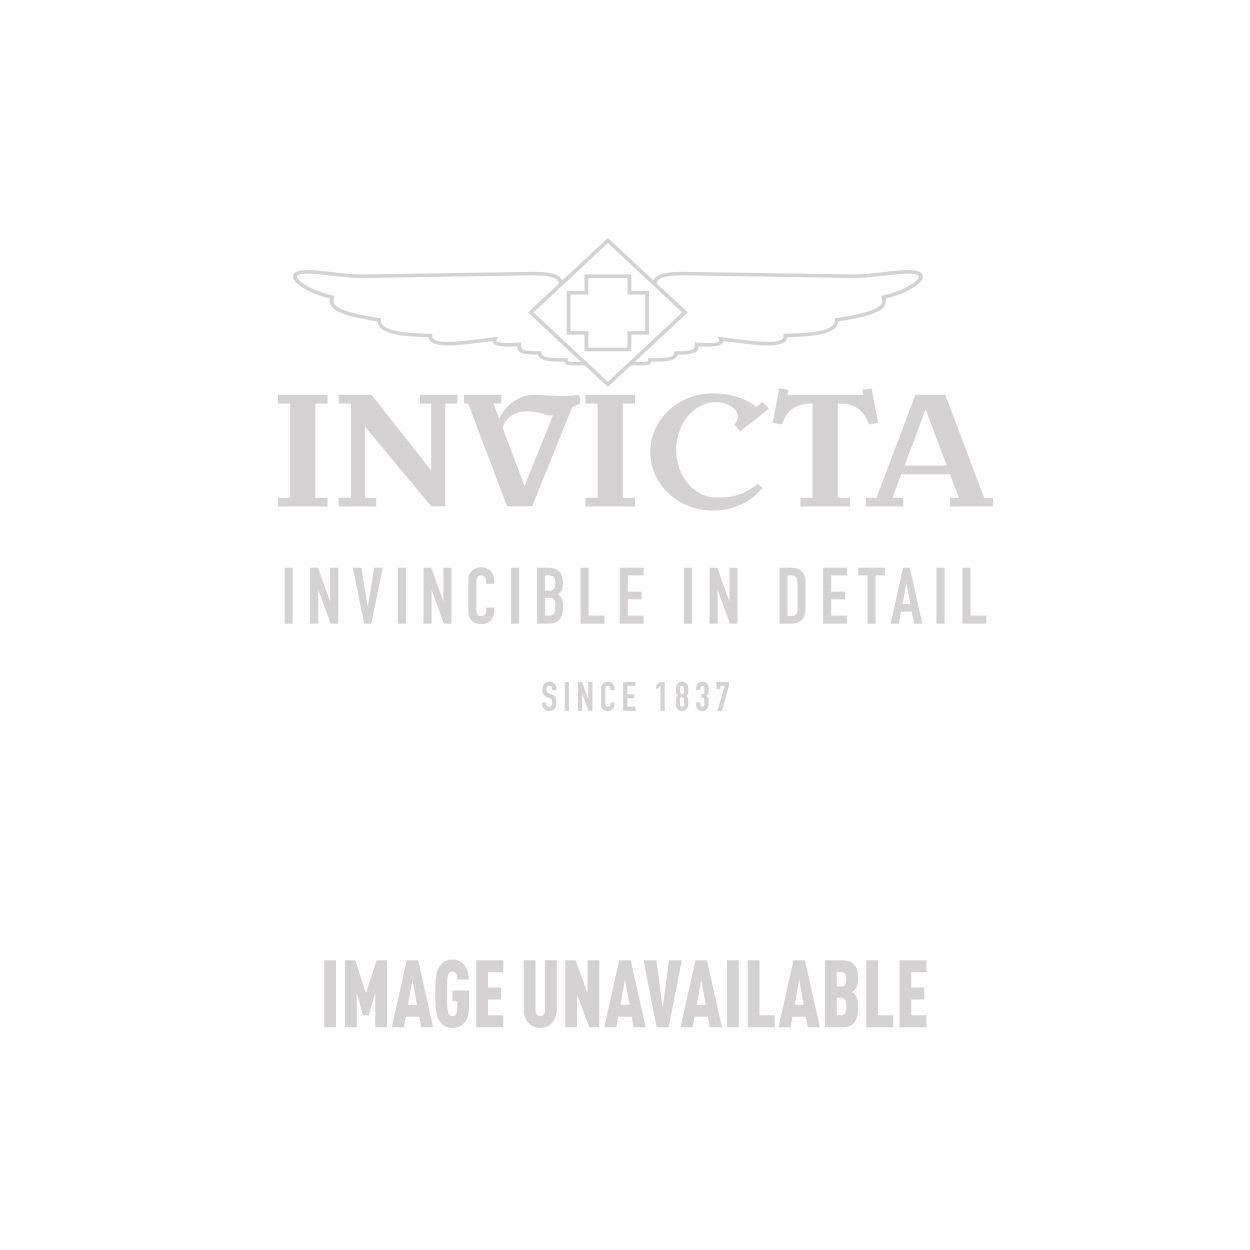 Invicta Venom Swiss Made Quartz Watch - Stainless Steel case with Steel, Black tone Stainless Steel, Polyurethane band - Model 6118